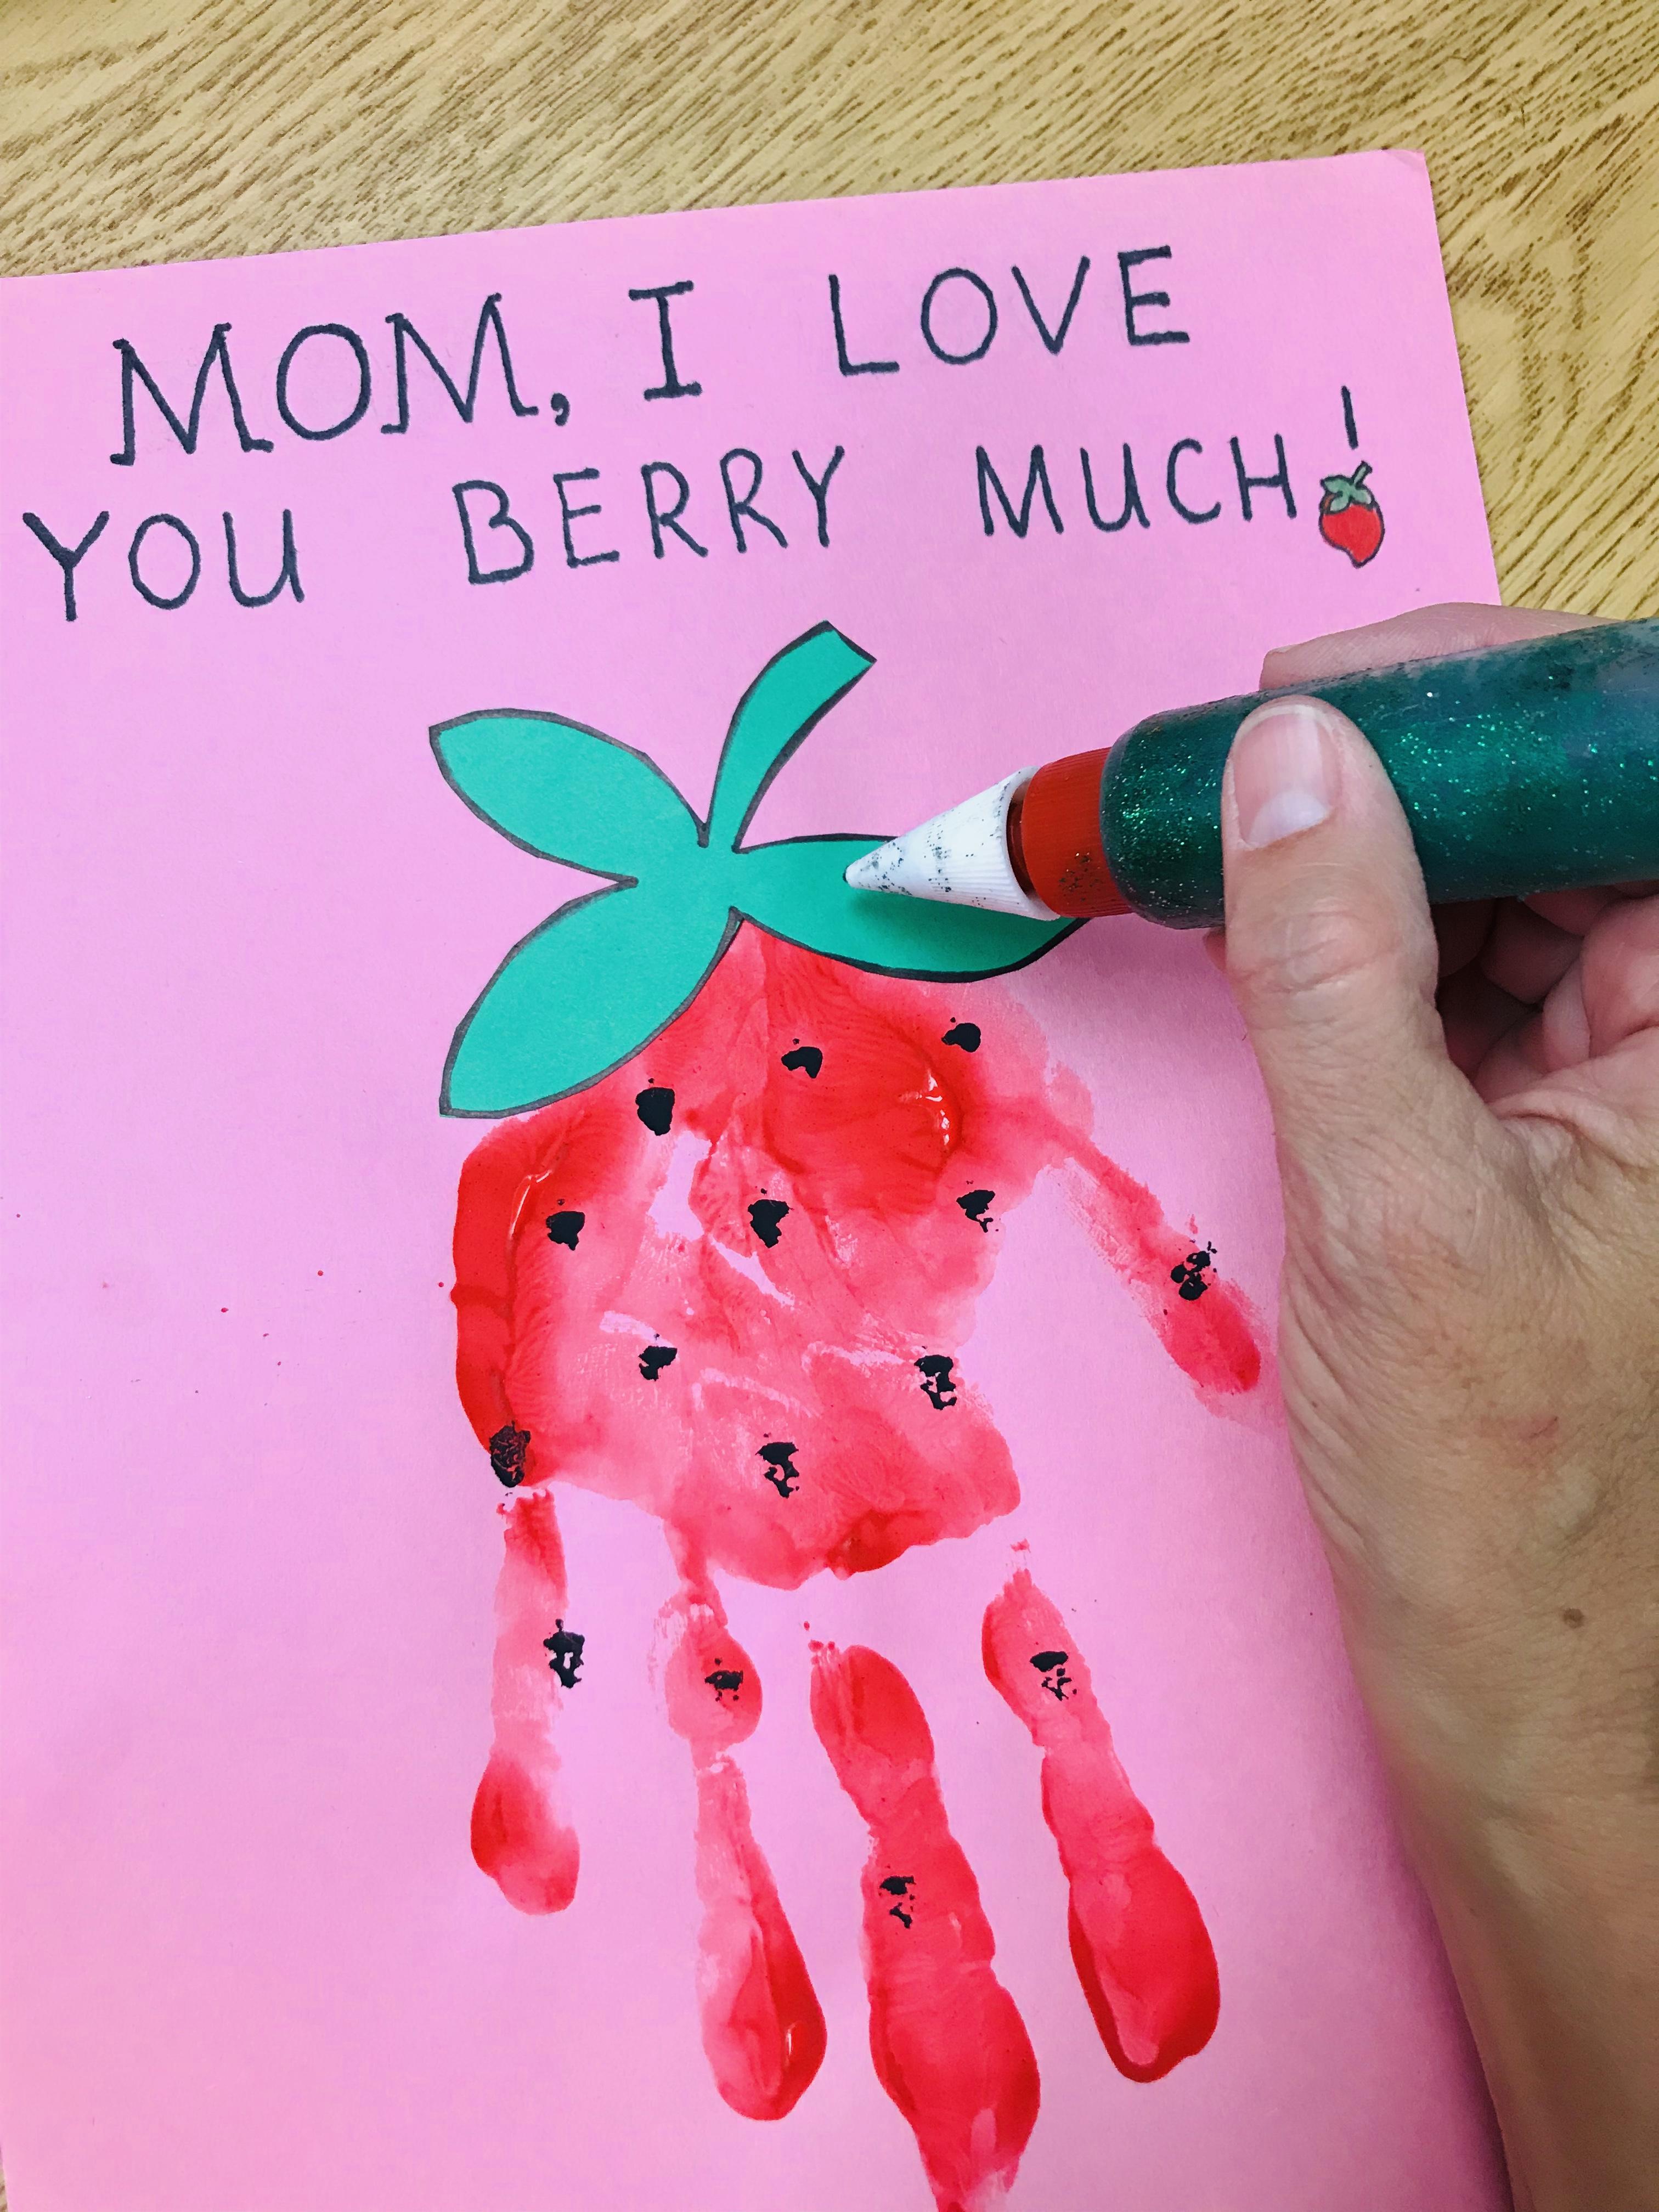 Glitter applicator to strawberry stem